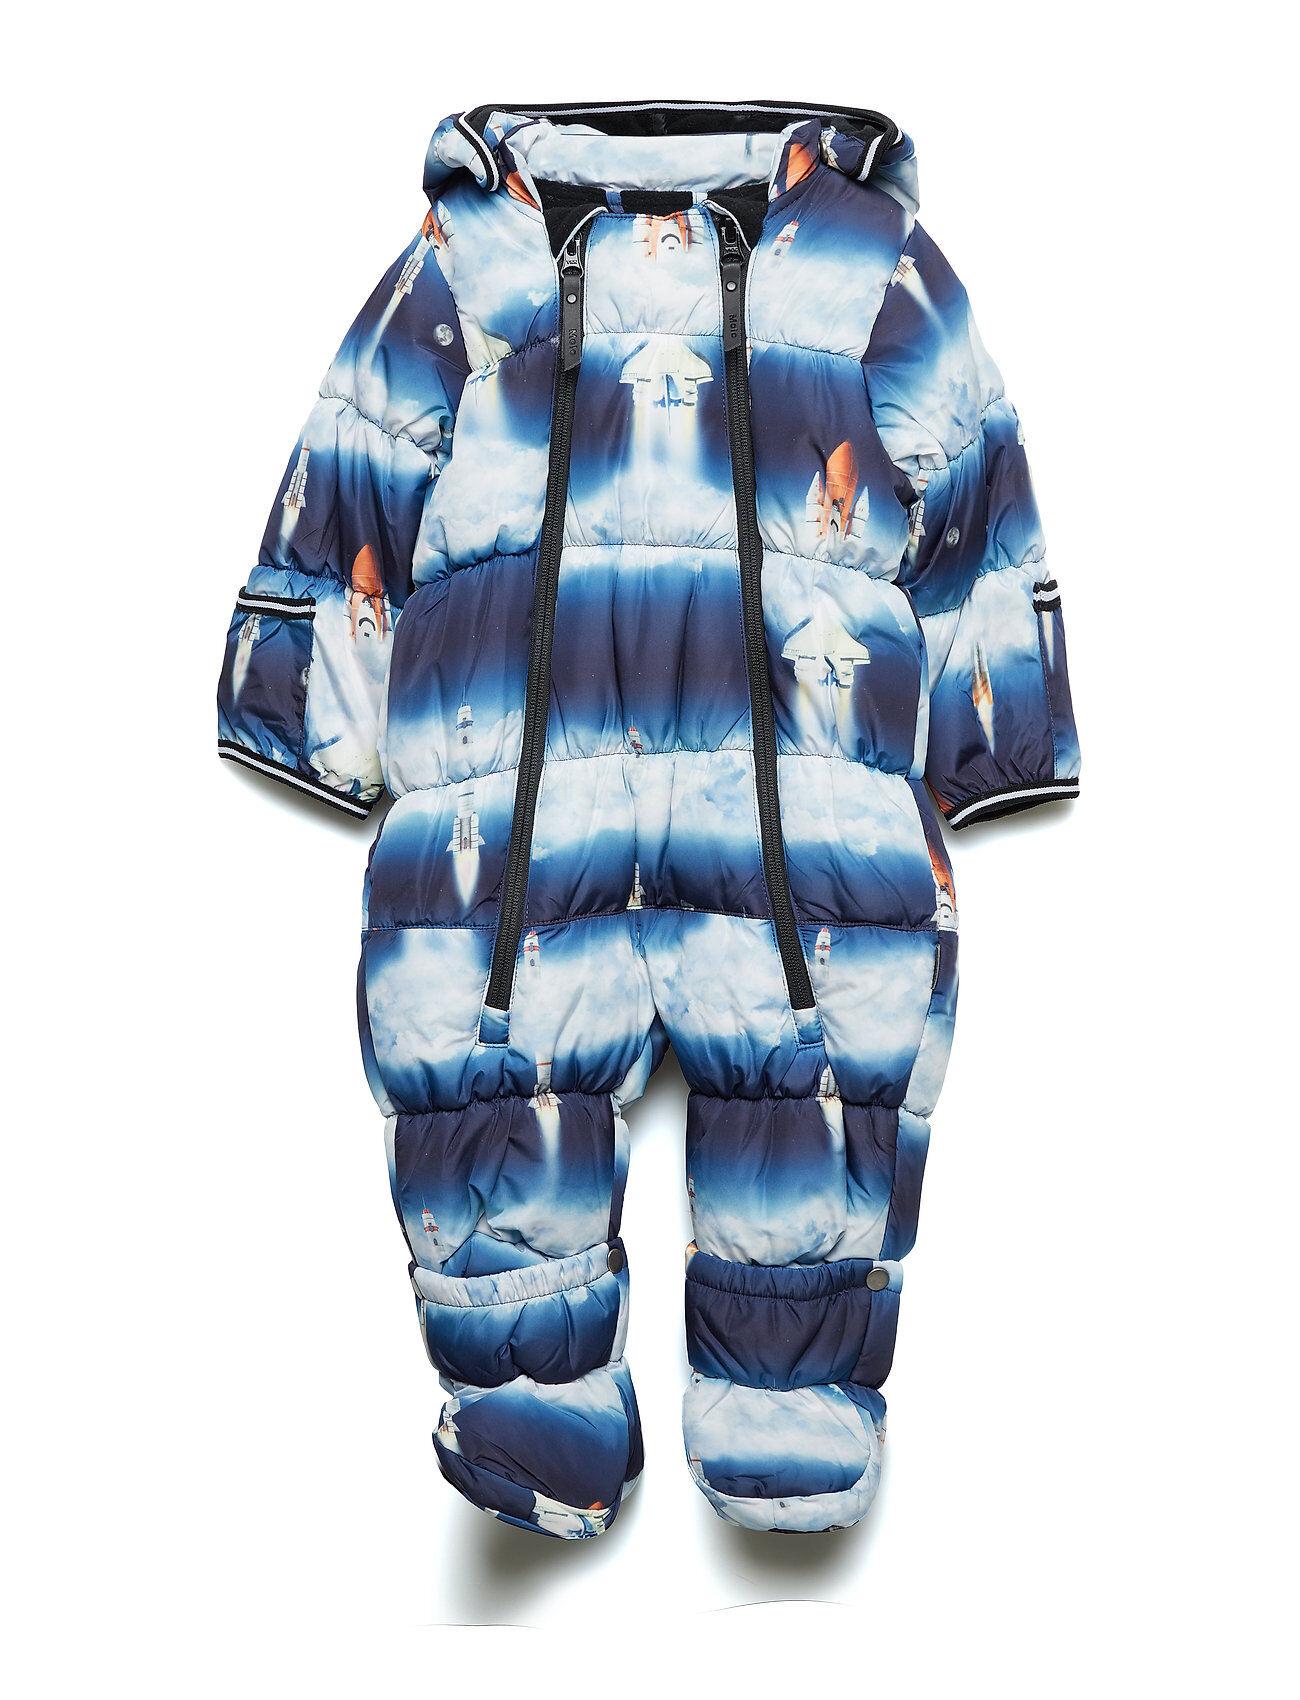 Molo Hebe Outerwear Snow/ski Clothing Snow/ski Suits & Sets Sininen Molo